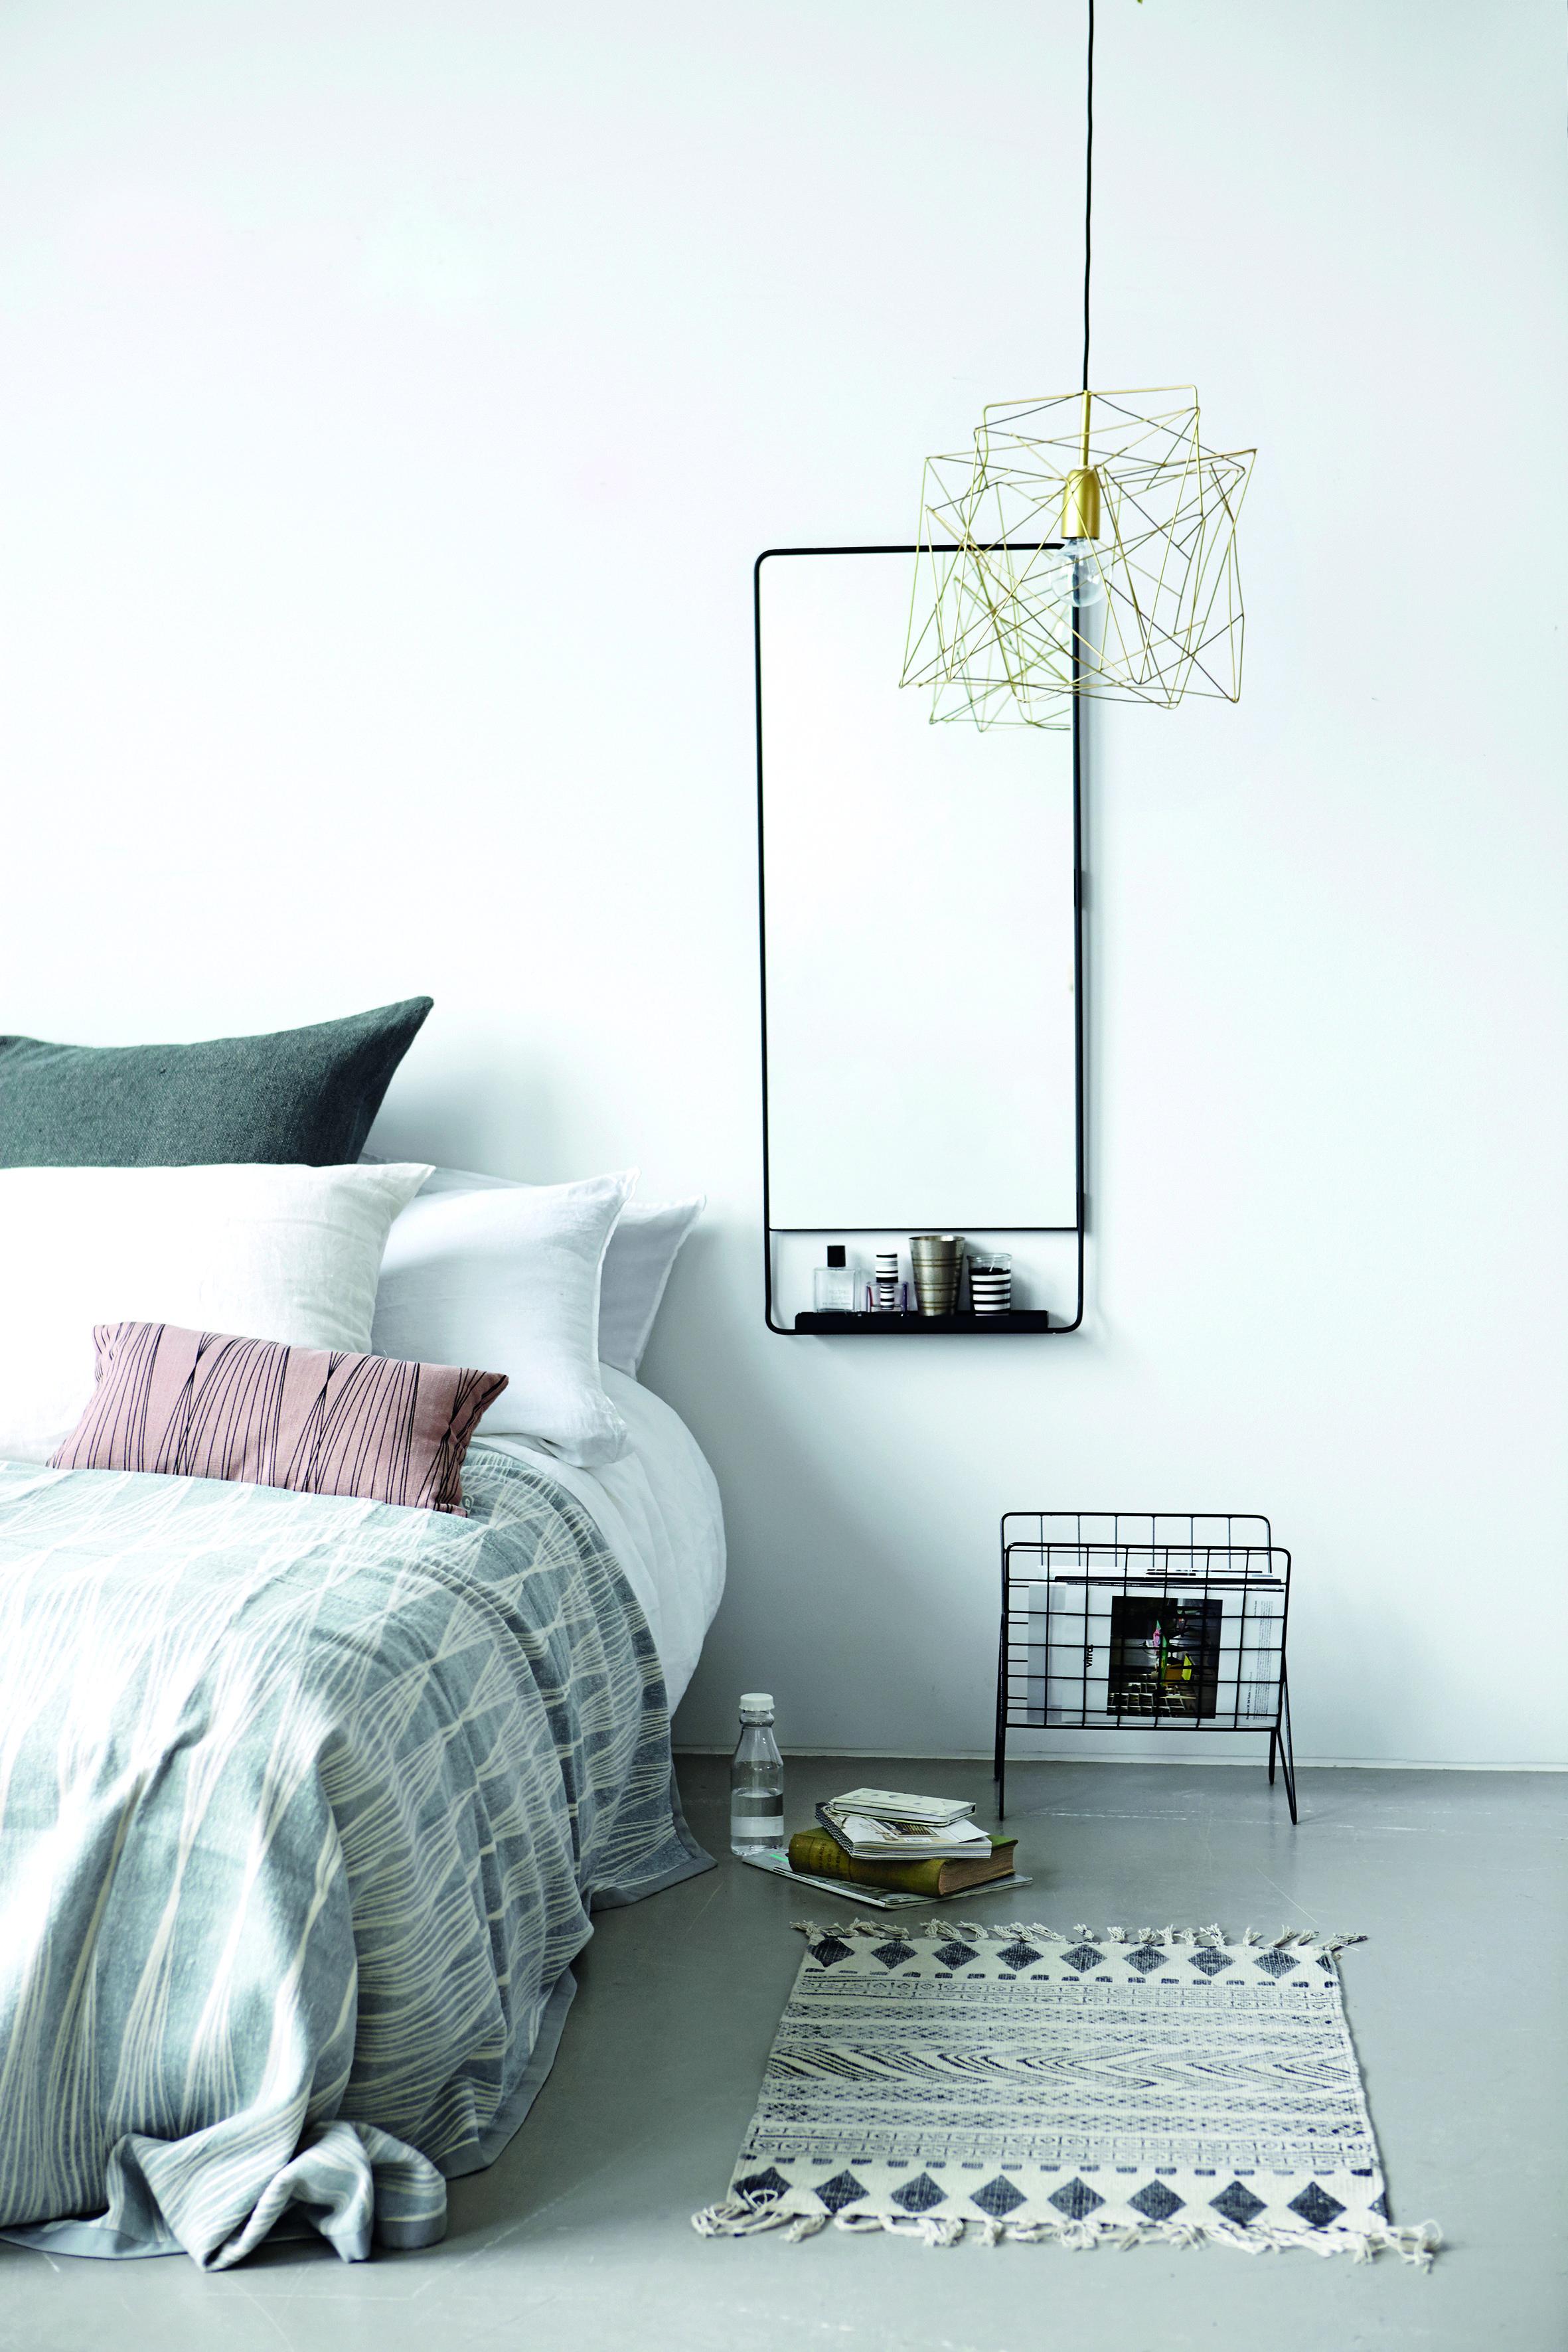 Heldere en lichte slaapkamer - Shopinstijl.nl | House doctor, House ...